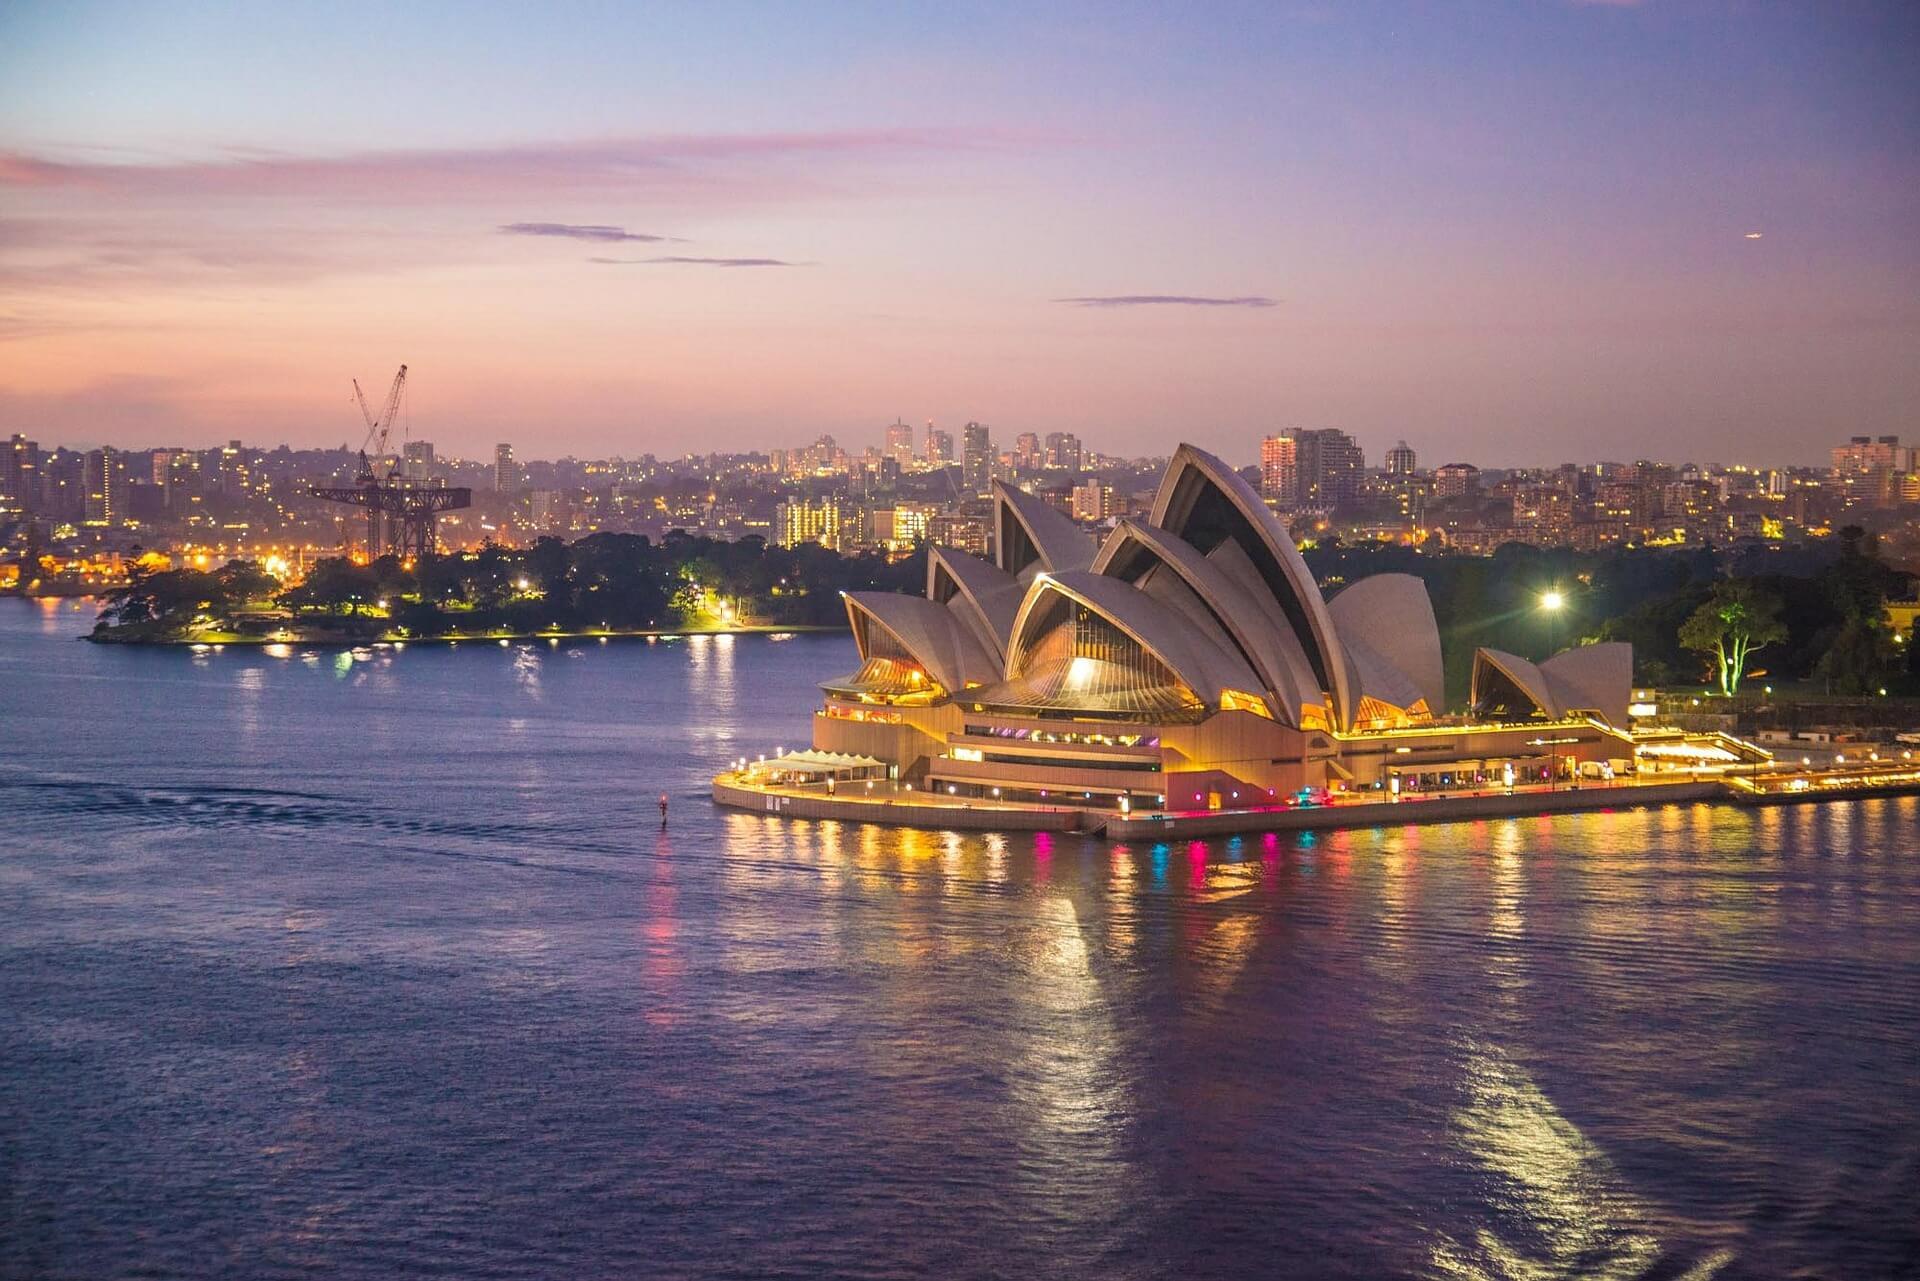 sydney opera house 354375 1920 - Australian Parent Visa offers a path to reunite families